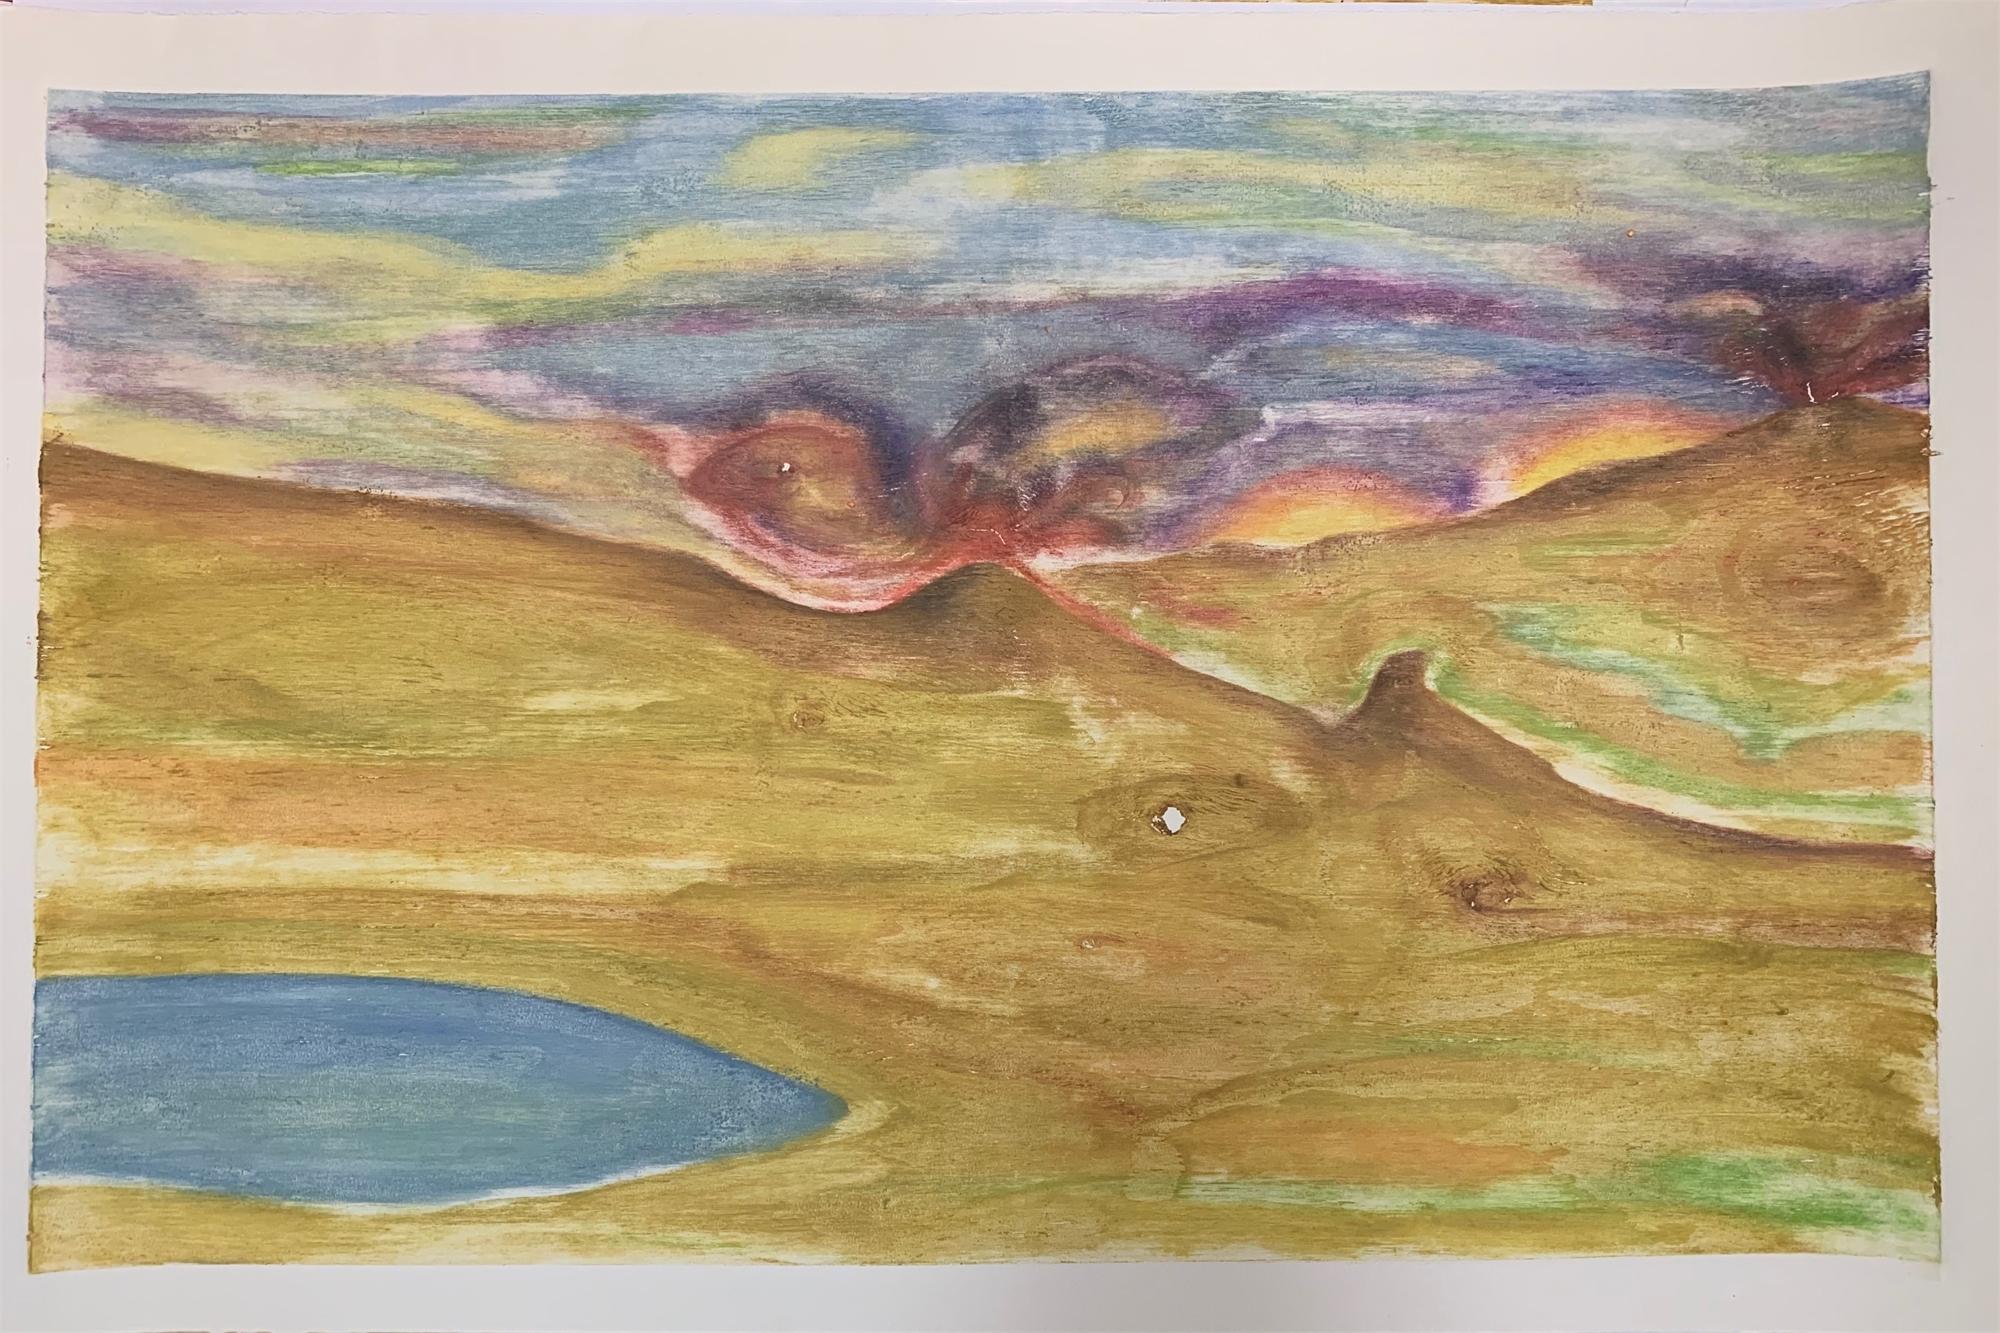 Untitled, abstract landscape by David Hefner